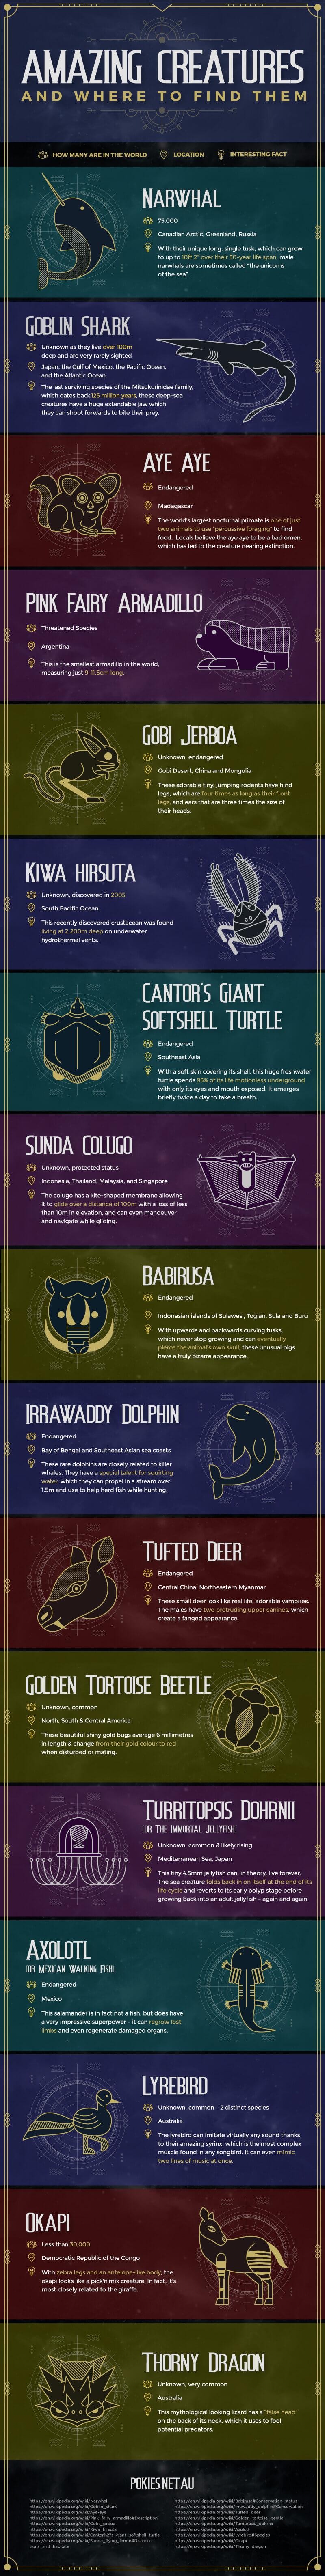 amazing creatures around the world infographic